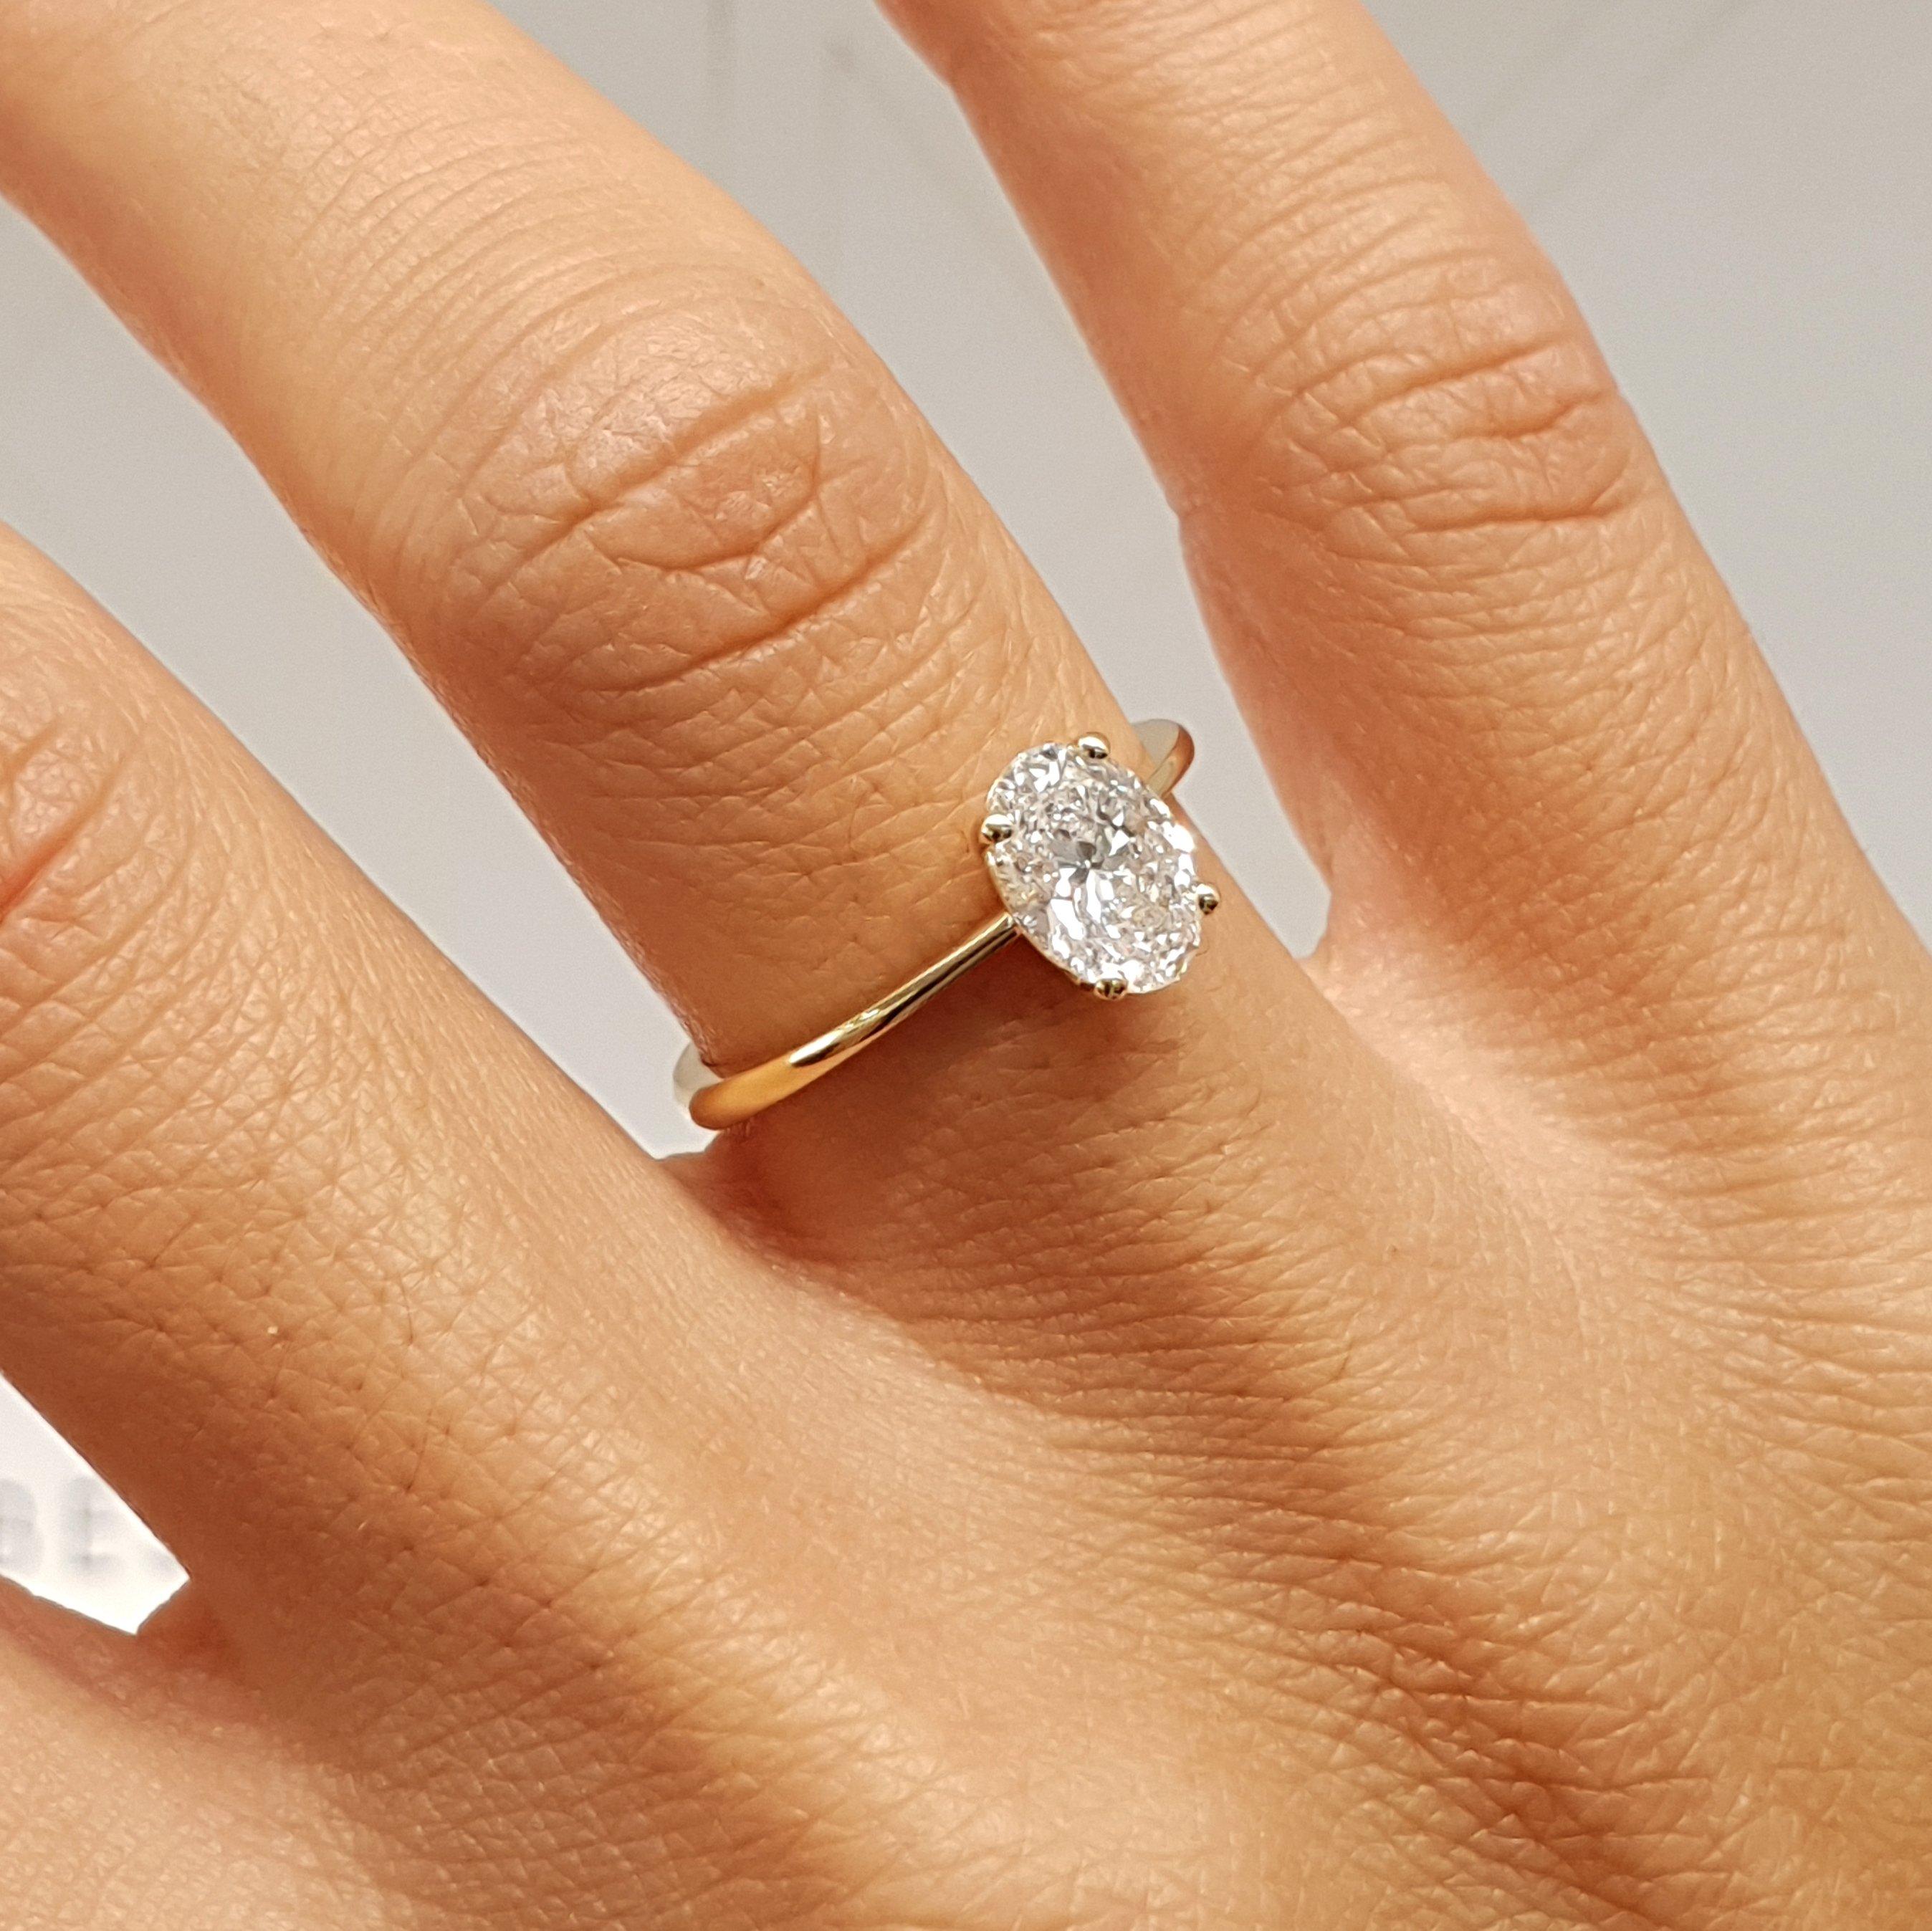 The Julia Engagement Ring 1 Carat Oval E Vs2 14k Yellow Gold Diamond Ring J99190 Yellow Gold Diamond Engagement Ring Oval Diamond Engagement Ring Diamond Wedding Bands